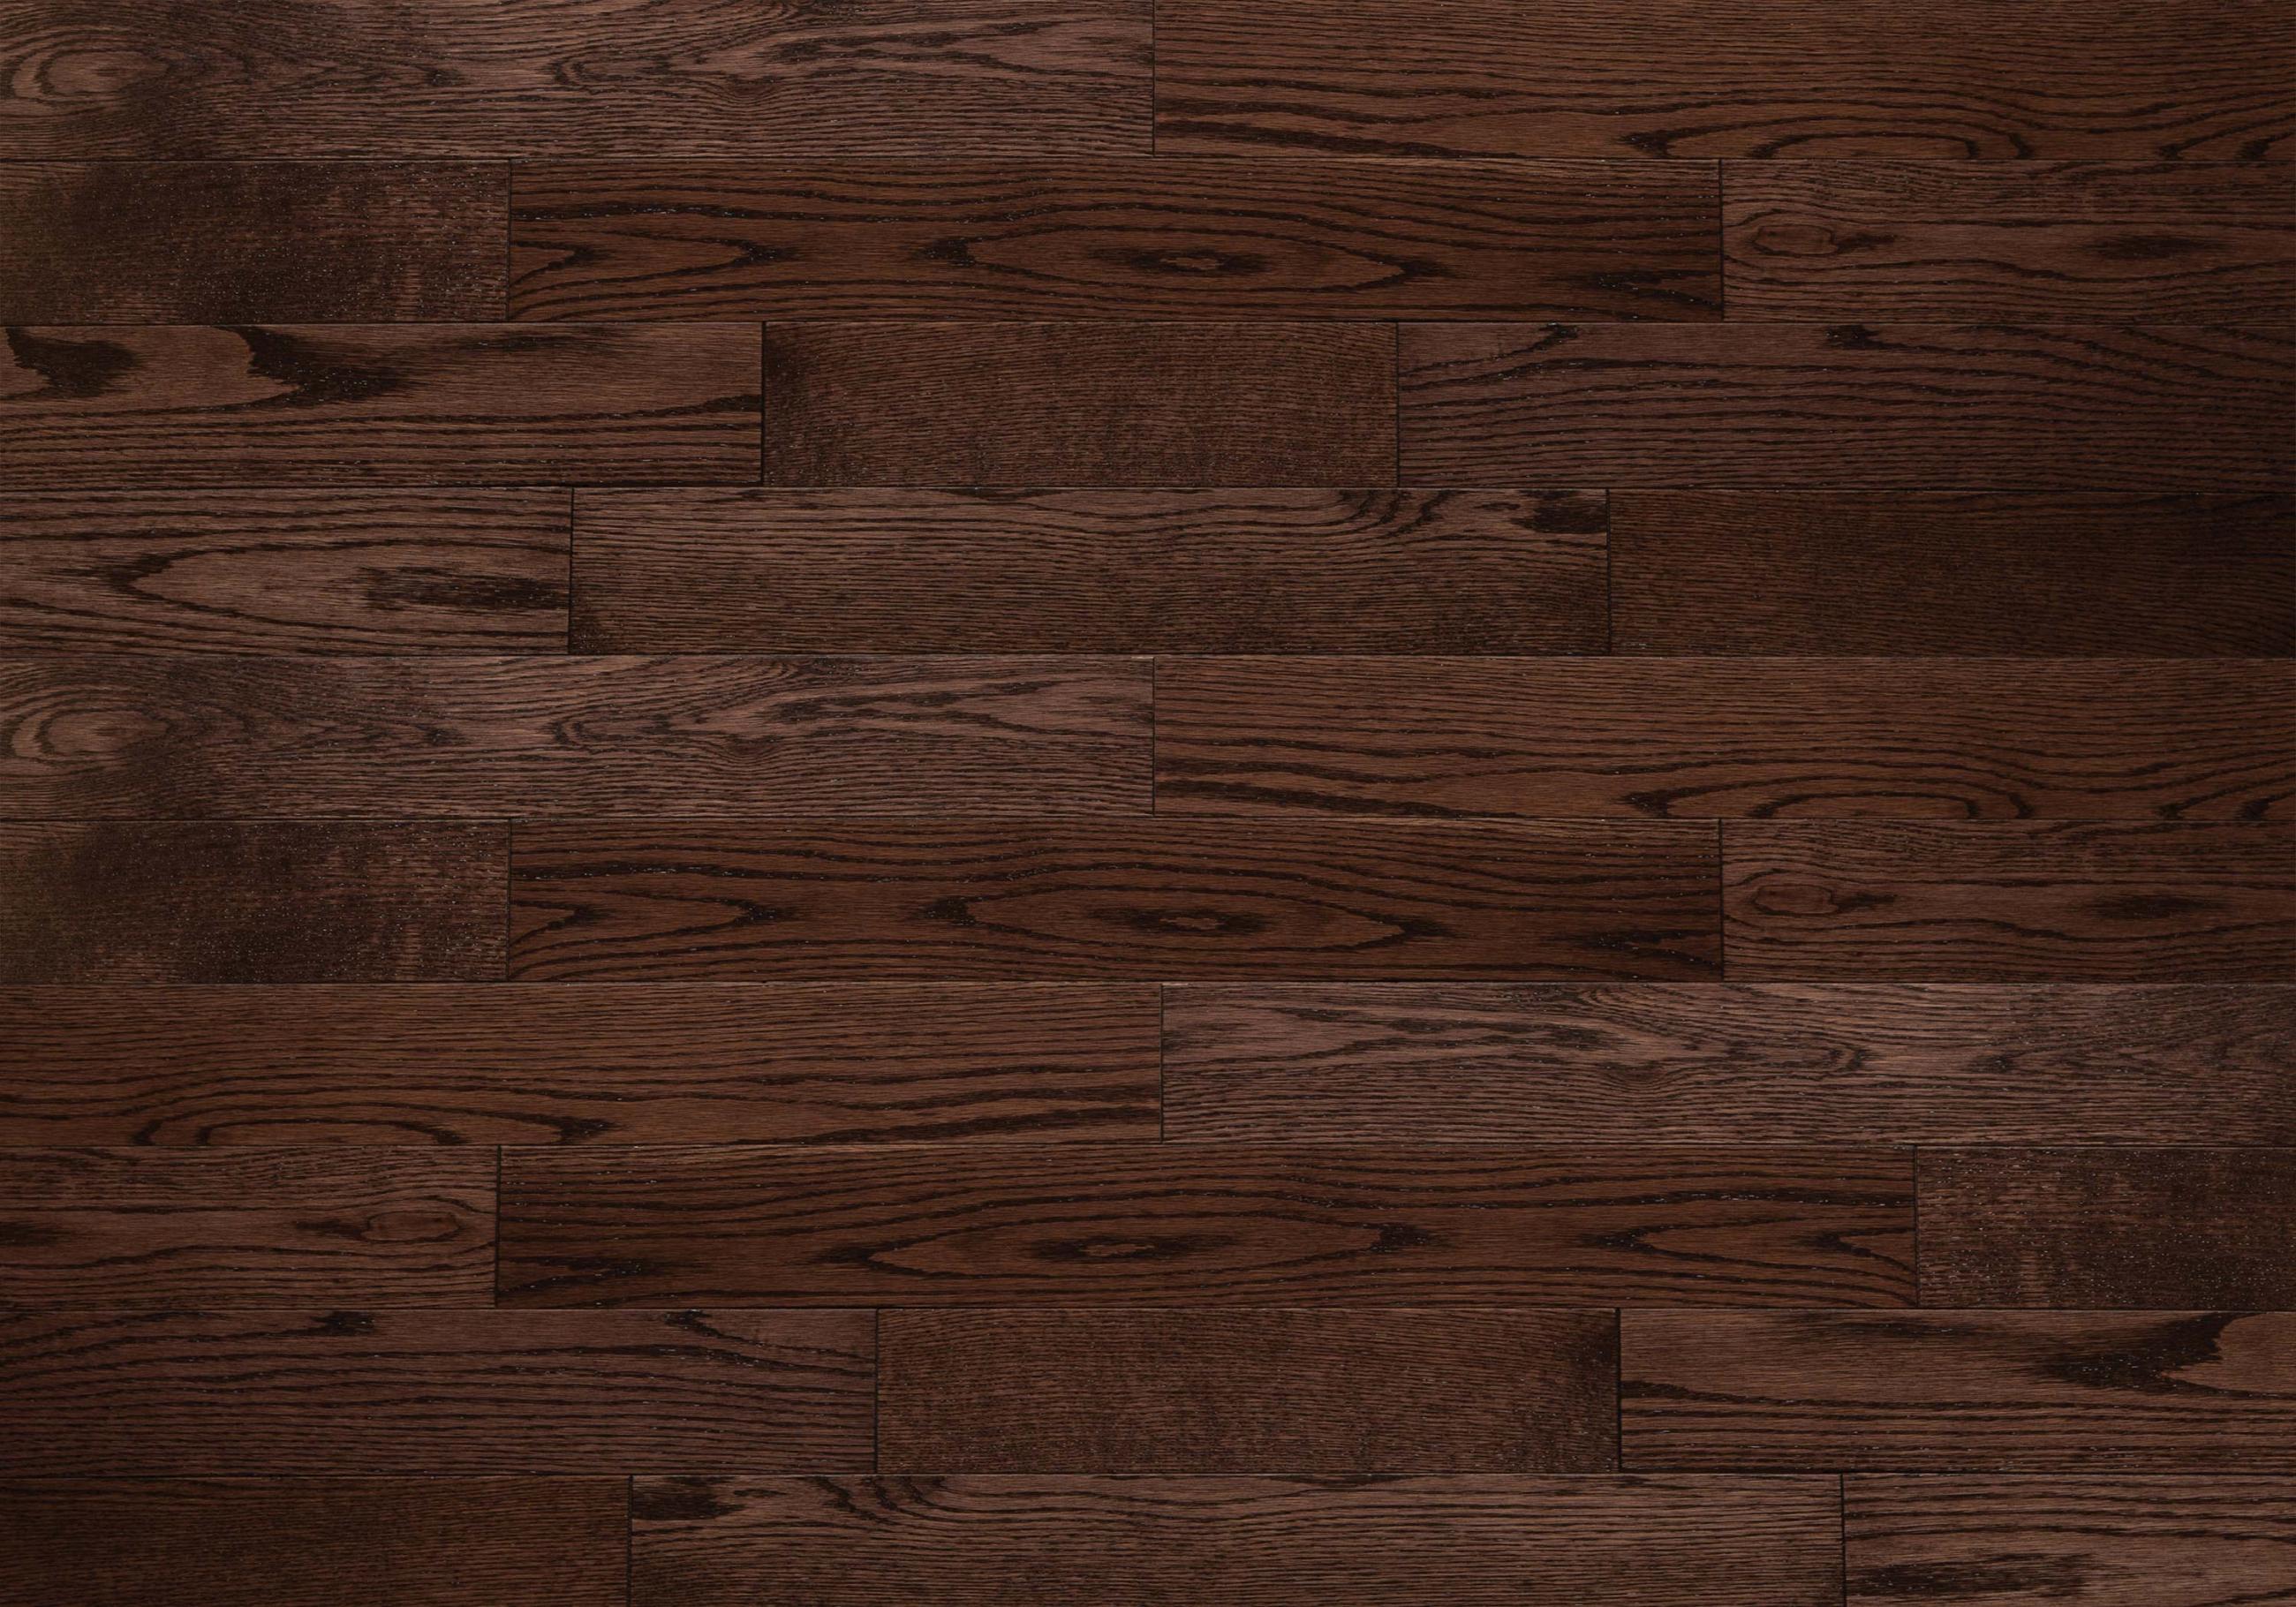 furniture colors for dark hardwood floors of light grey walls dark floors kozi home design in surprising light grey walls dark floors pics design inspiration